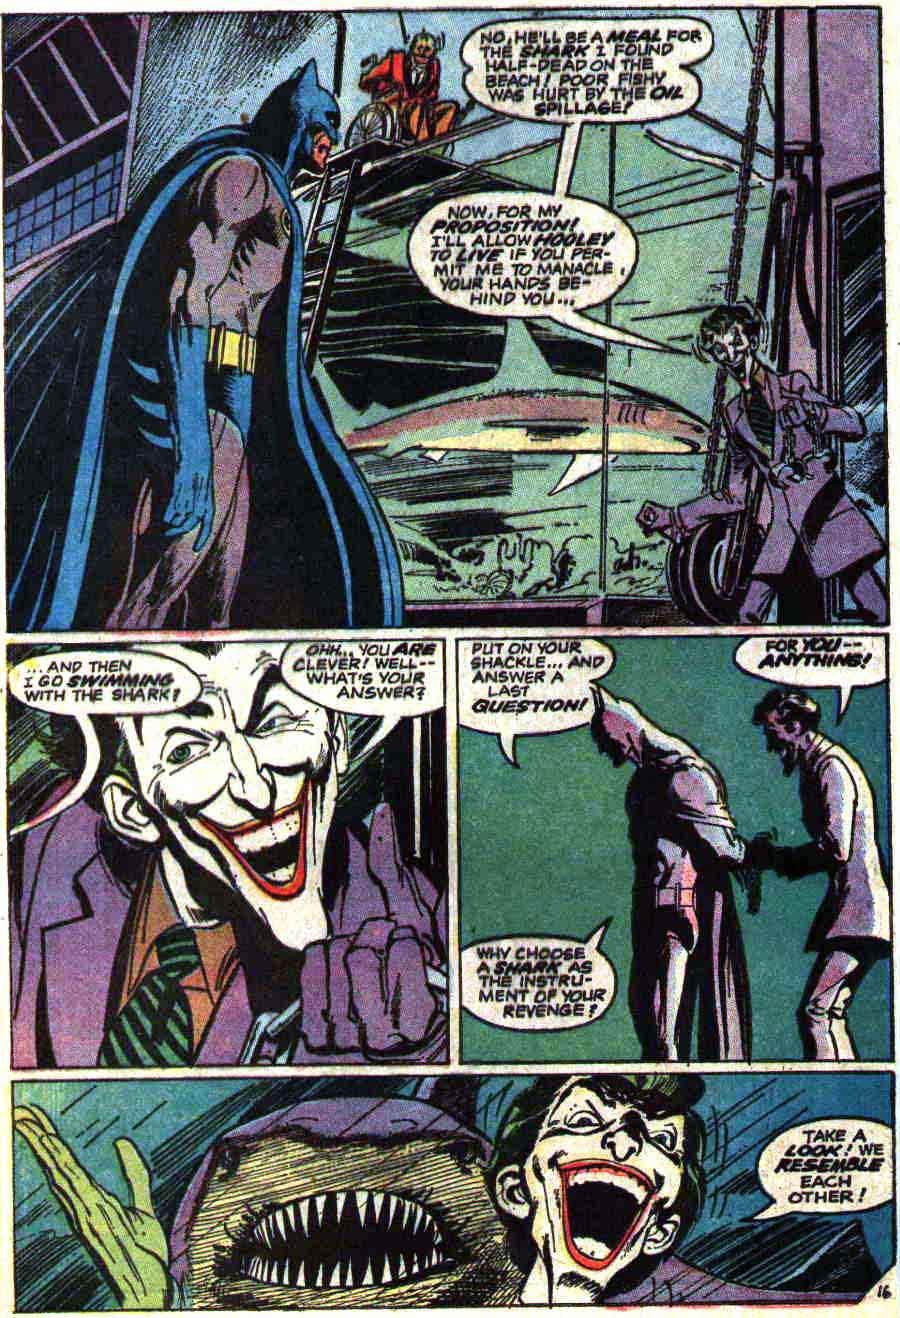 Batman #251 bronze age 1970s dc comic book page art by Neal Adams / classic Joker